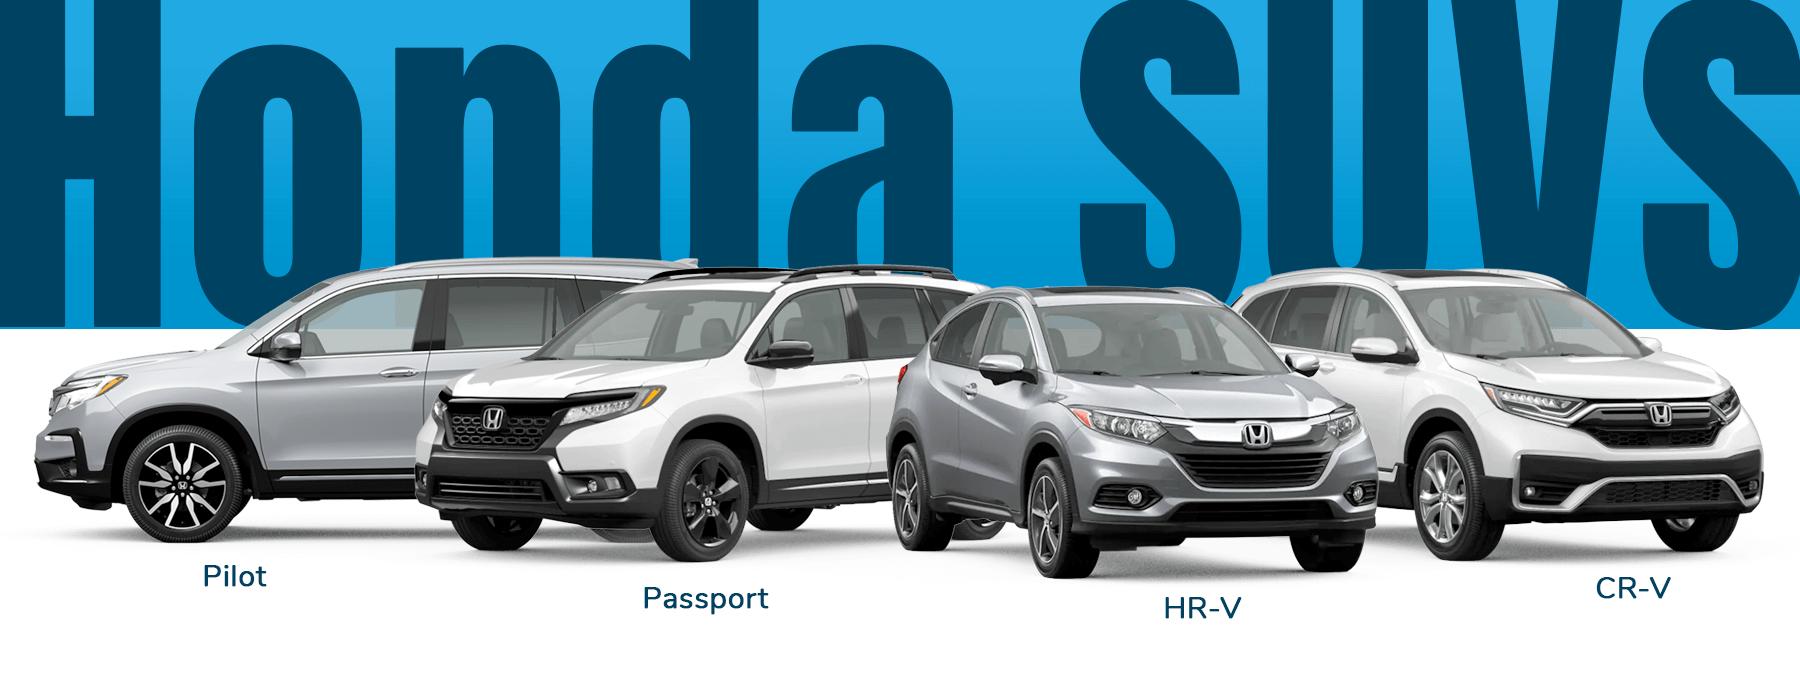 Honda SUVs Verus the Competition Slider